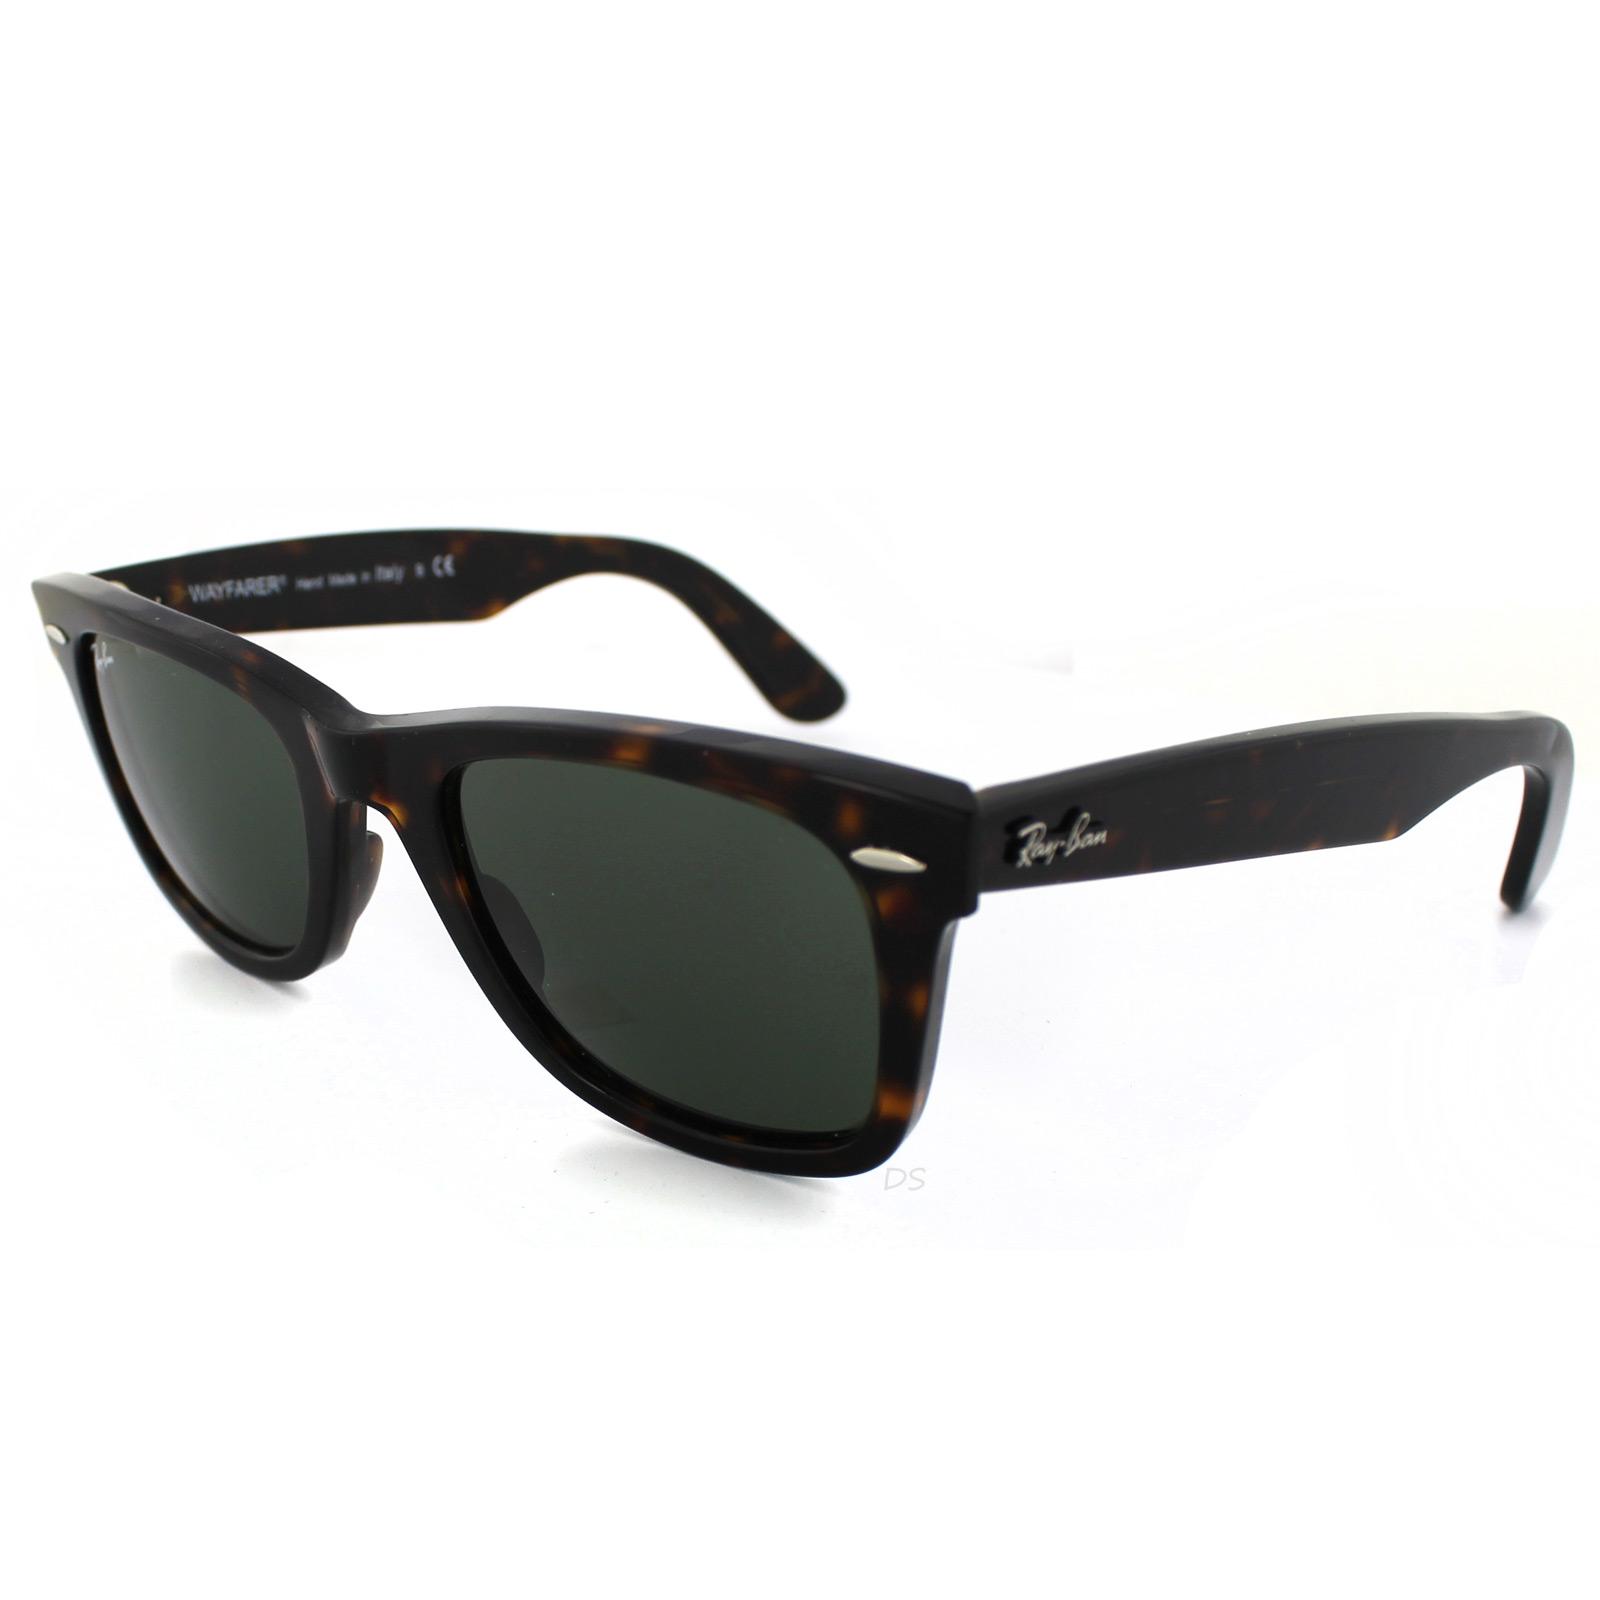 ray ban sunglasses wayfarer 2140 902 tortoise green g 15 medium 50mm ebay. Black Bedroom Furniture Sets. Home Design Ideas